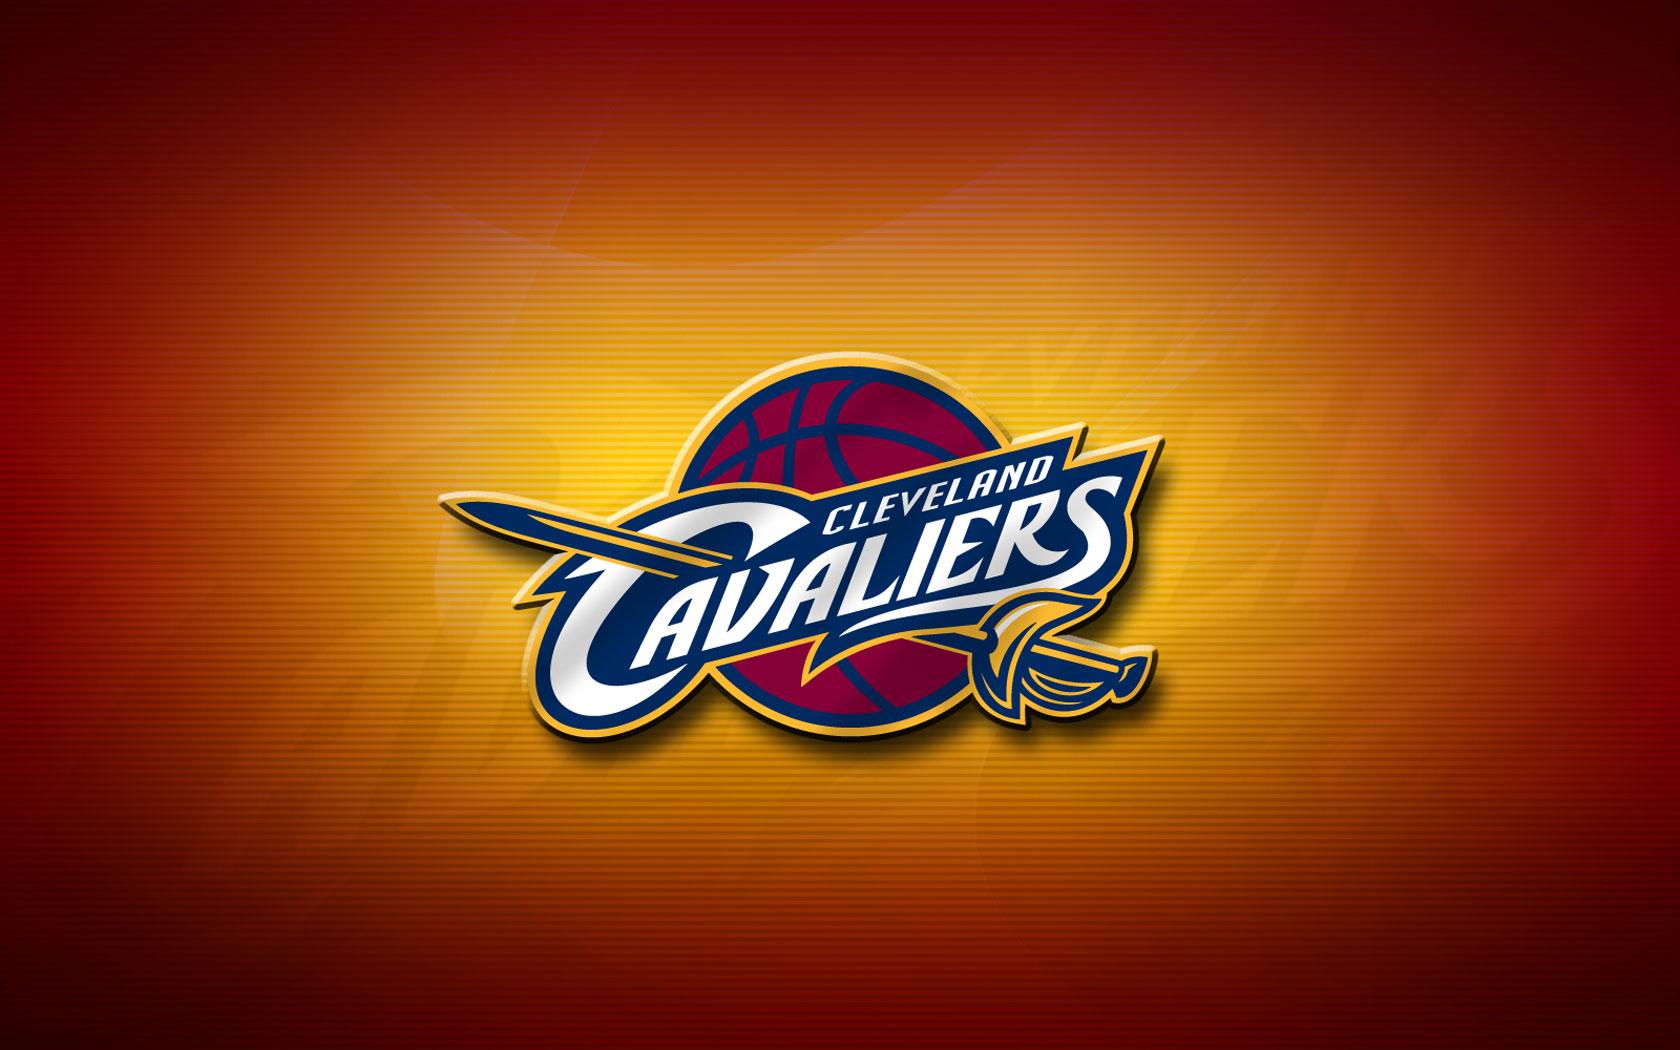 Cleveland Cavaliers.jpg